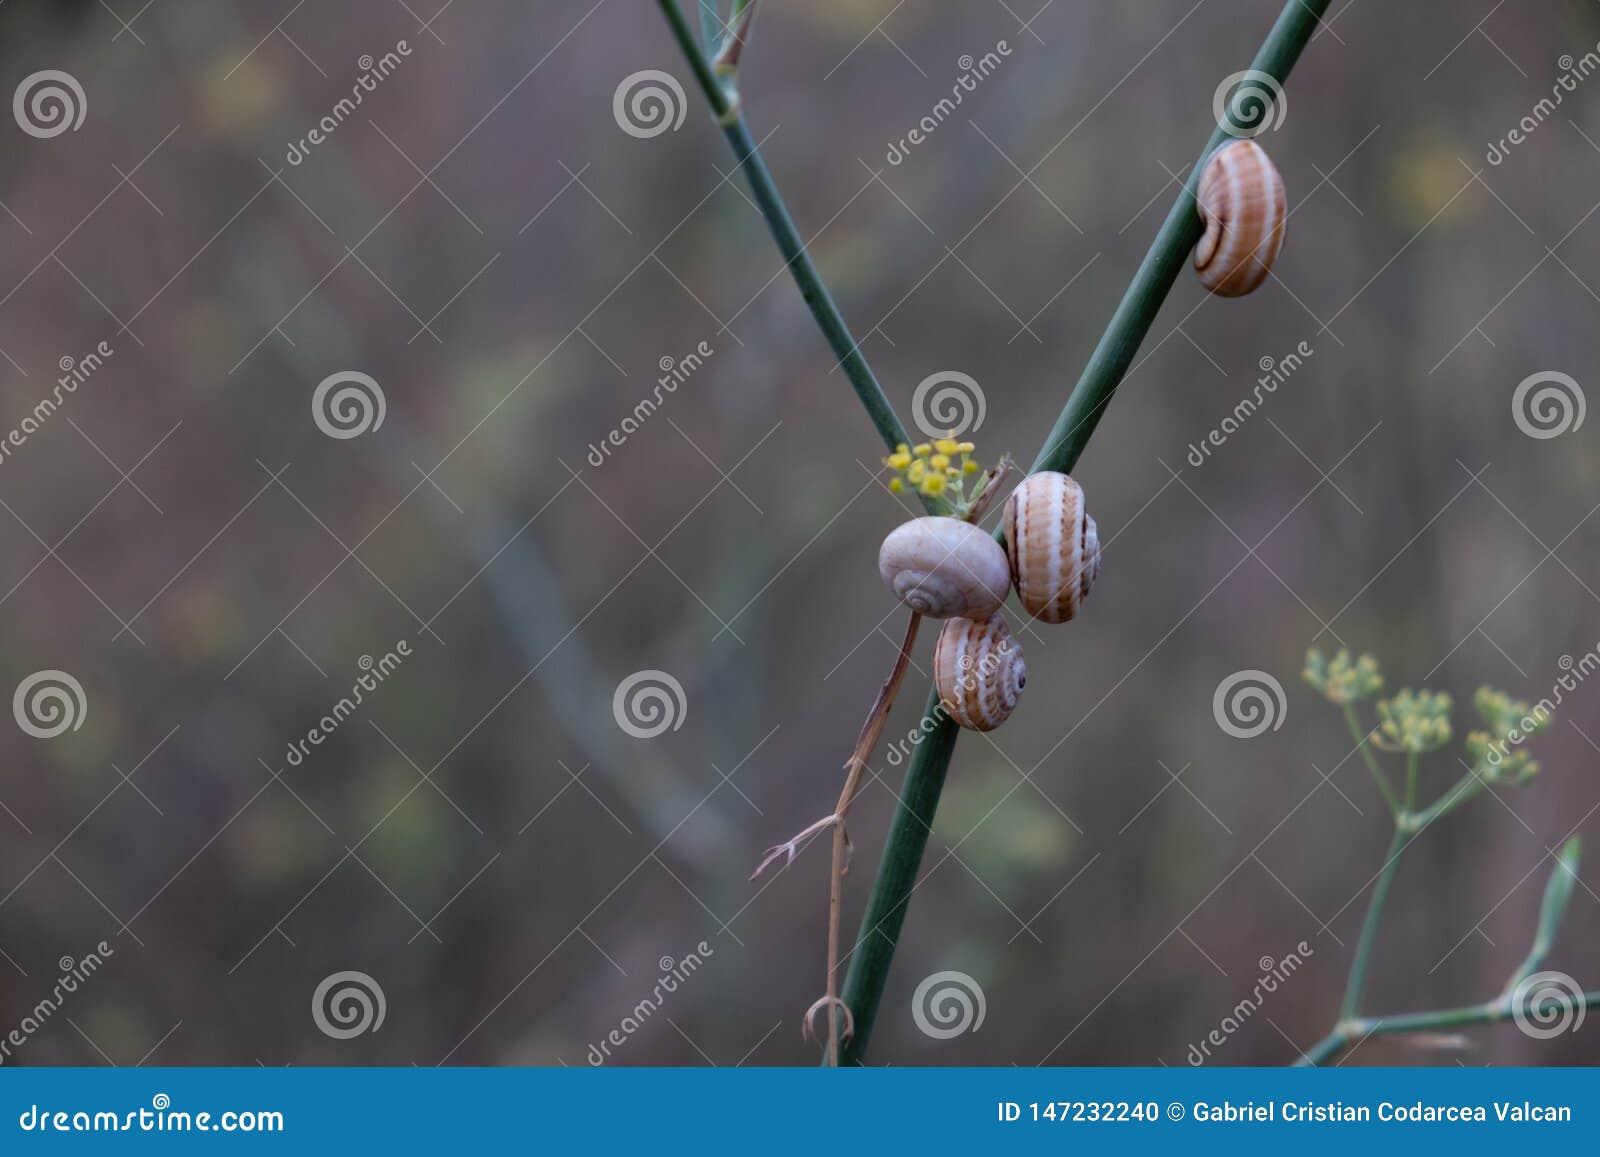 Group of snails on the same bush branch